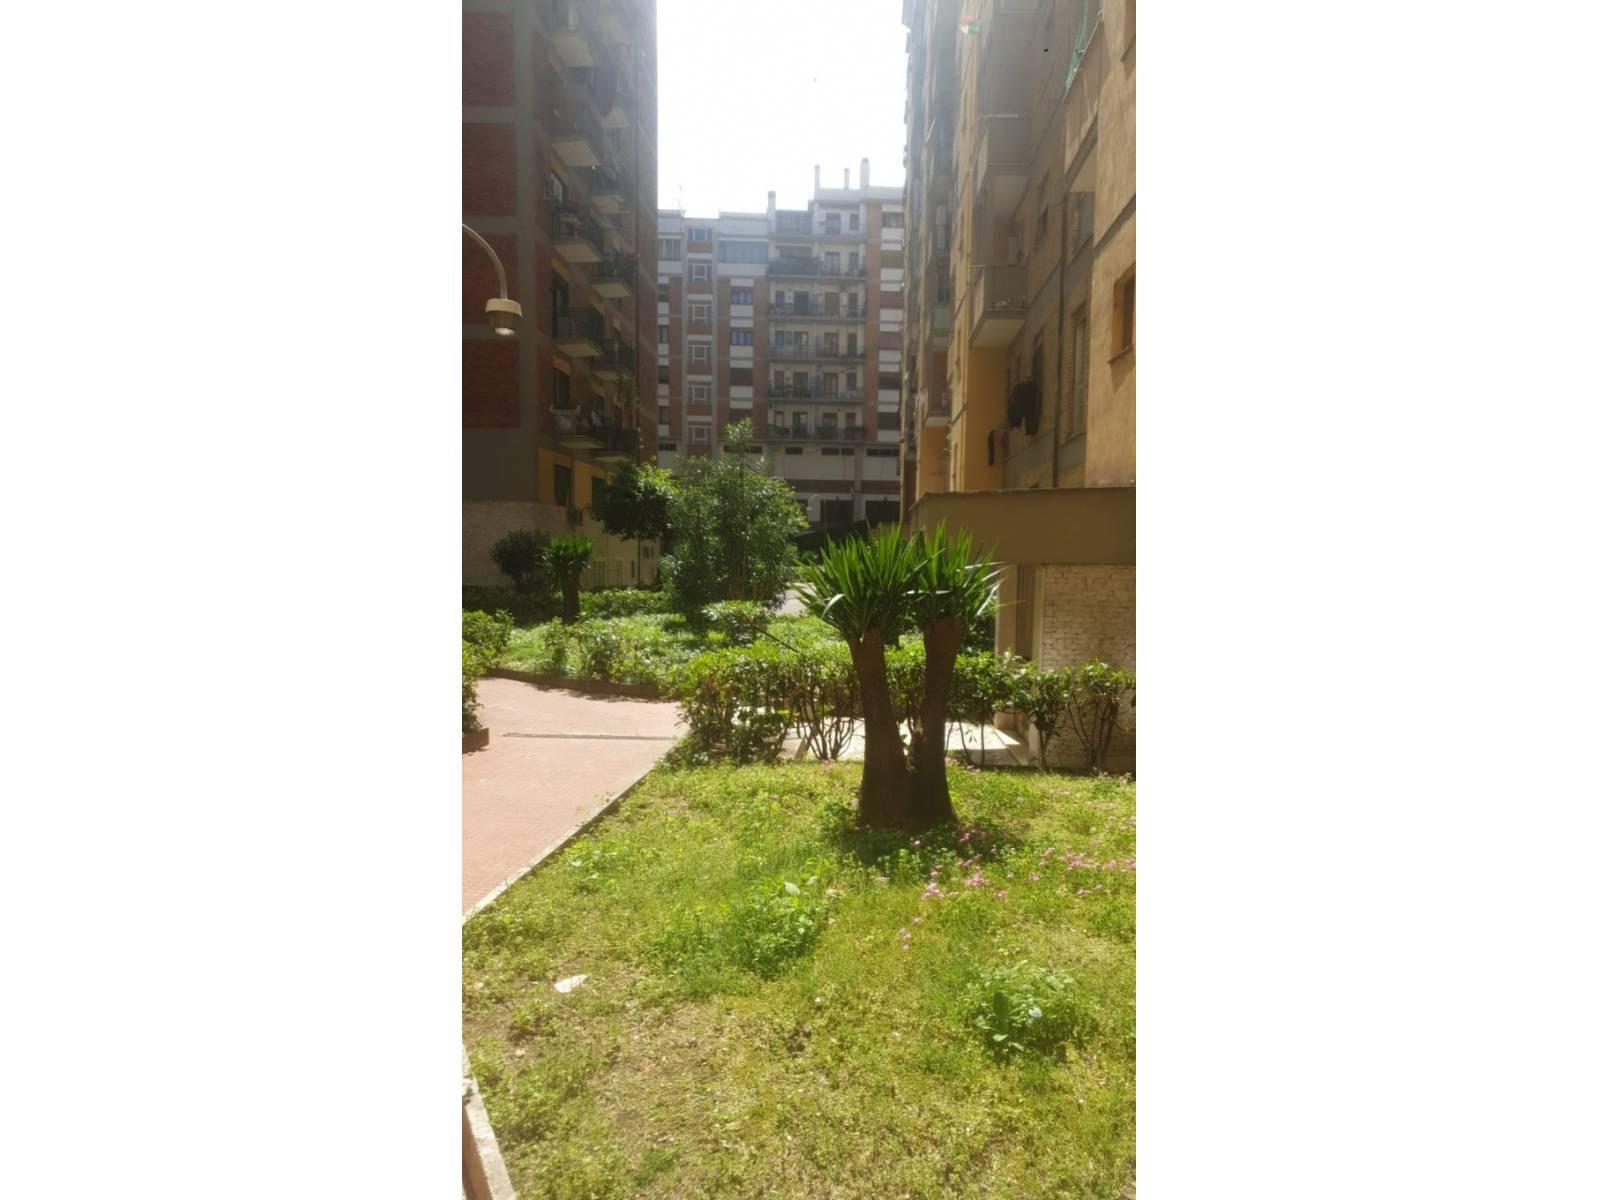 1118420076 Trilocale in Via Filippo Meda, Roma, Zona Tiburtina, Casal bruciato